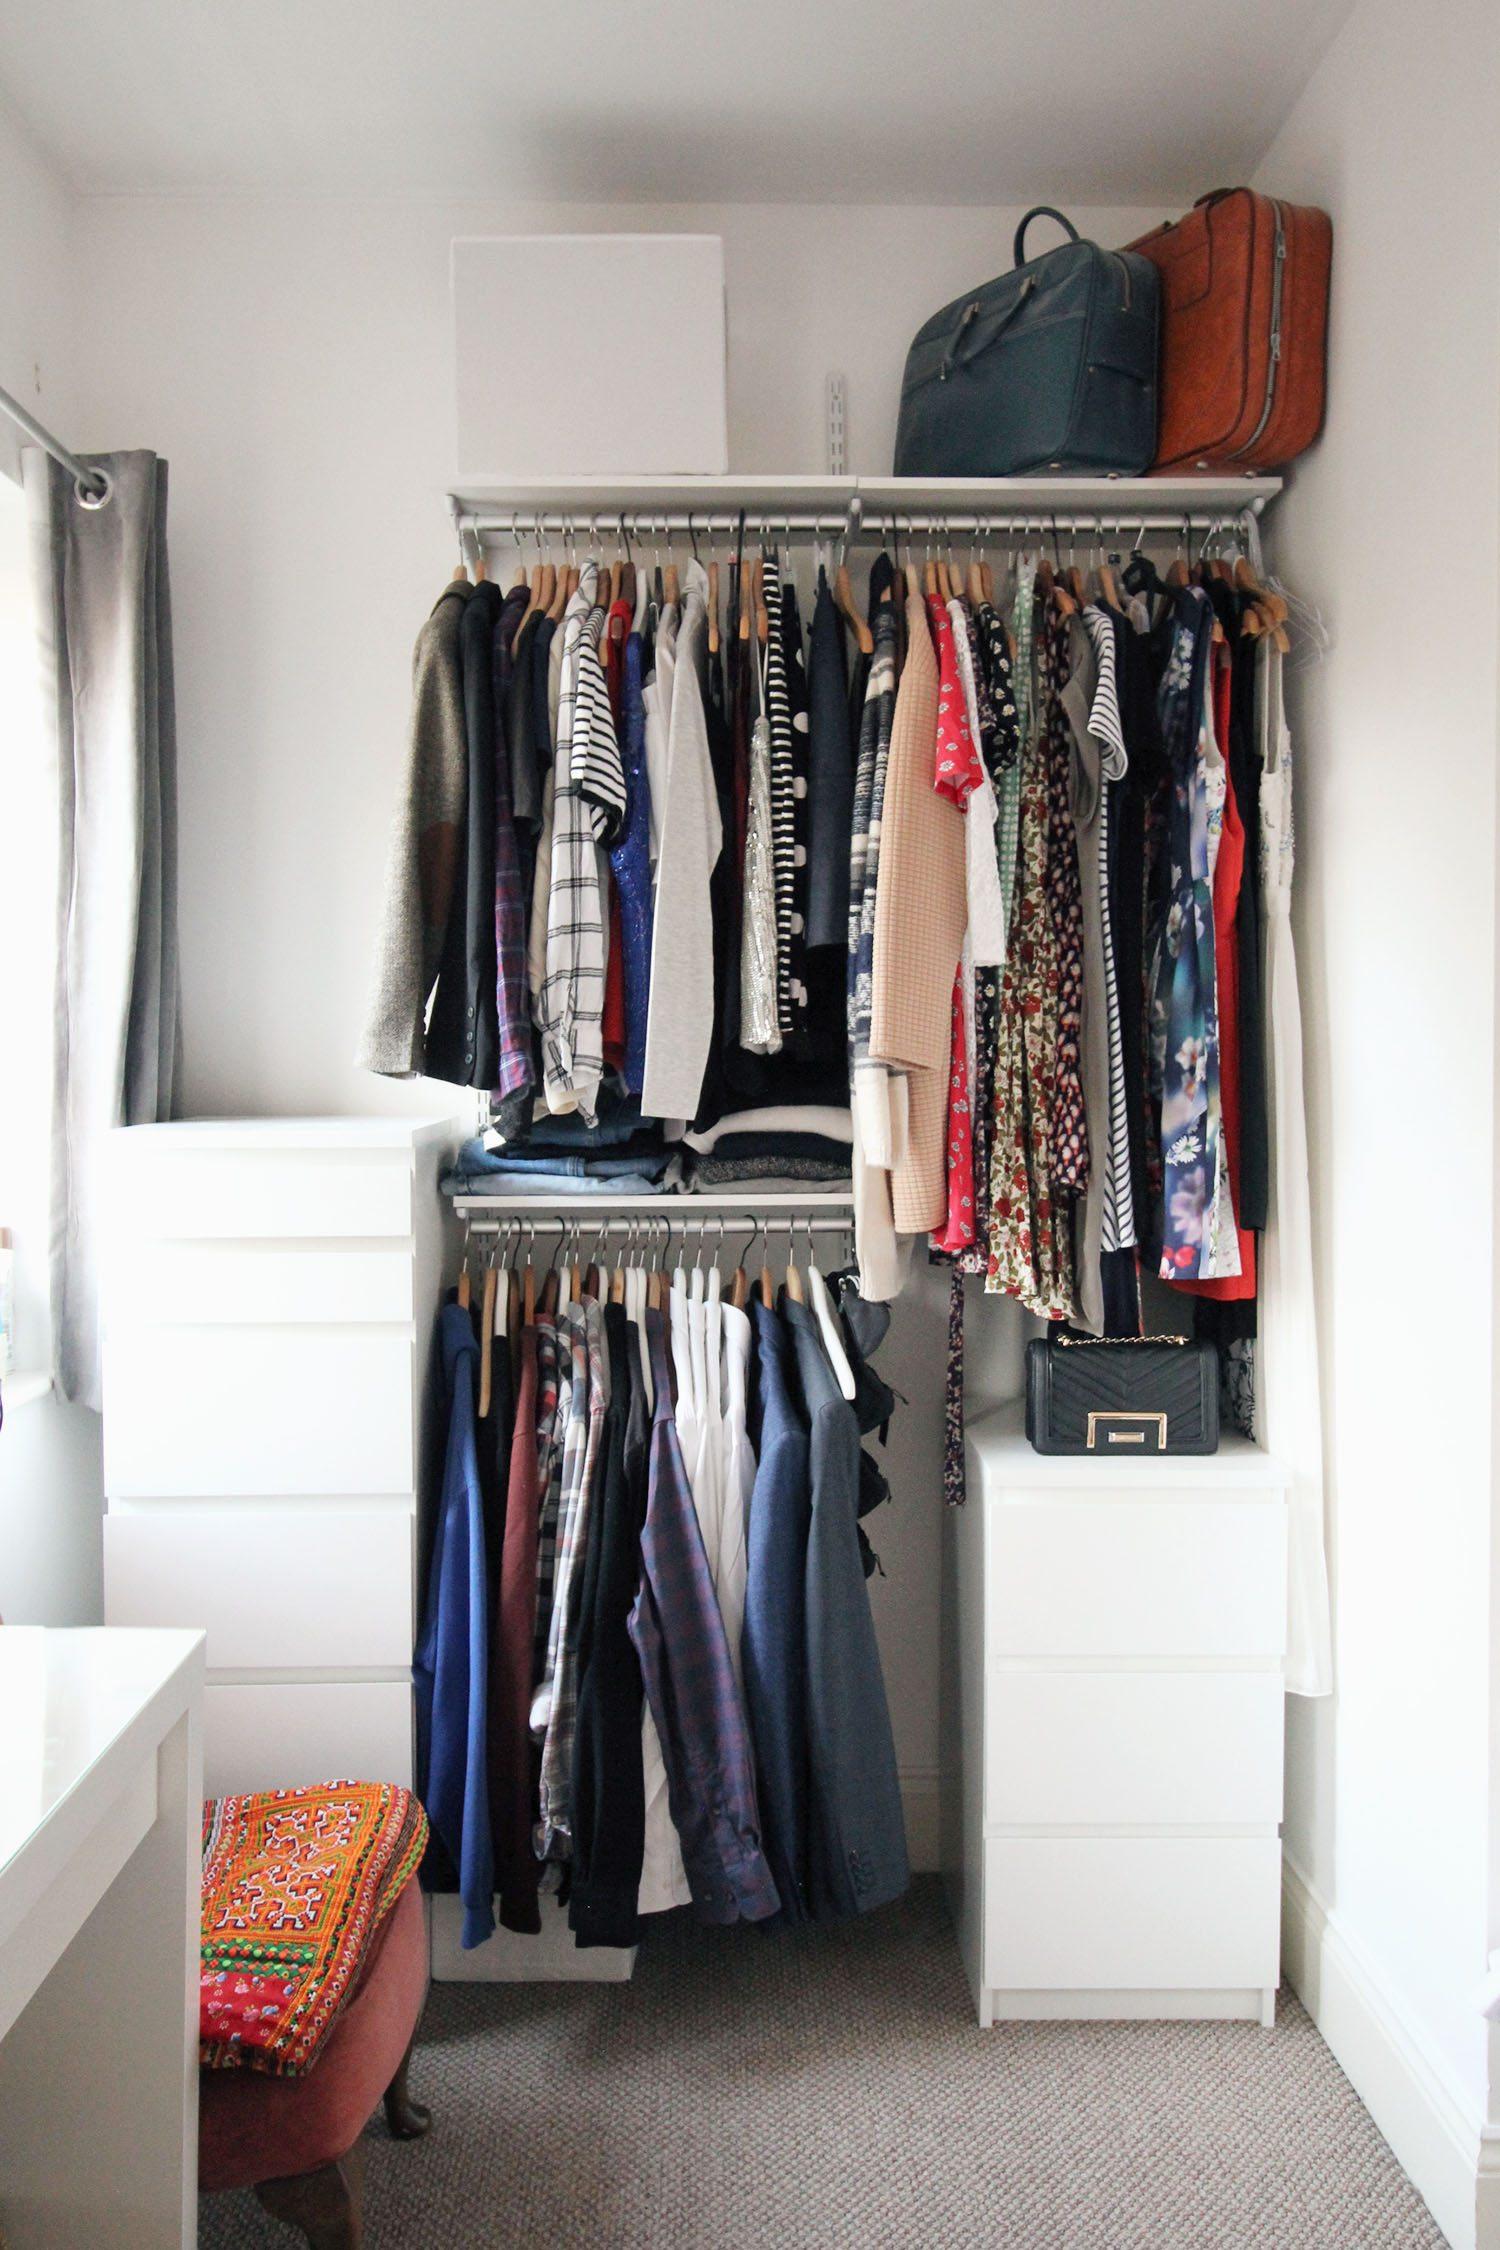 built-in-wardrobe-organised-closet